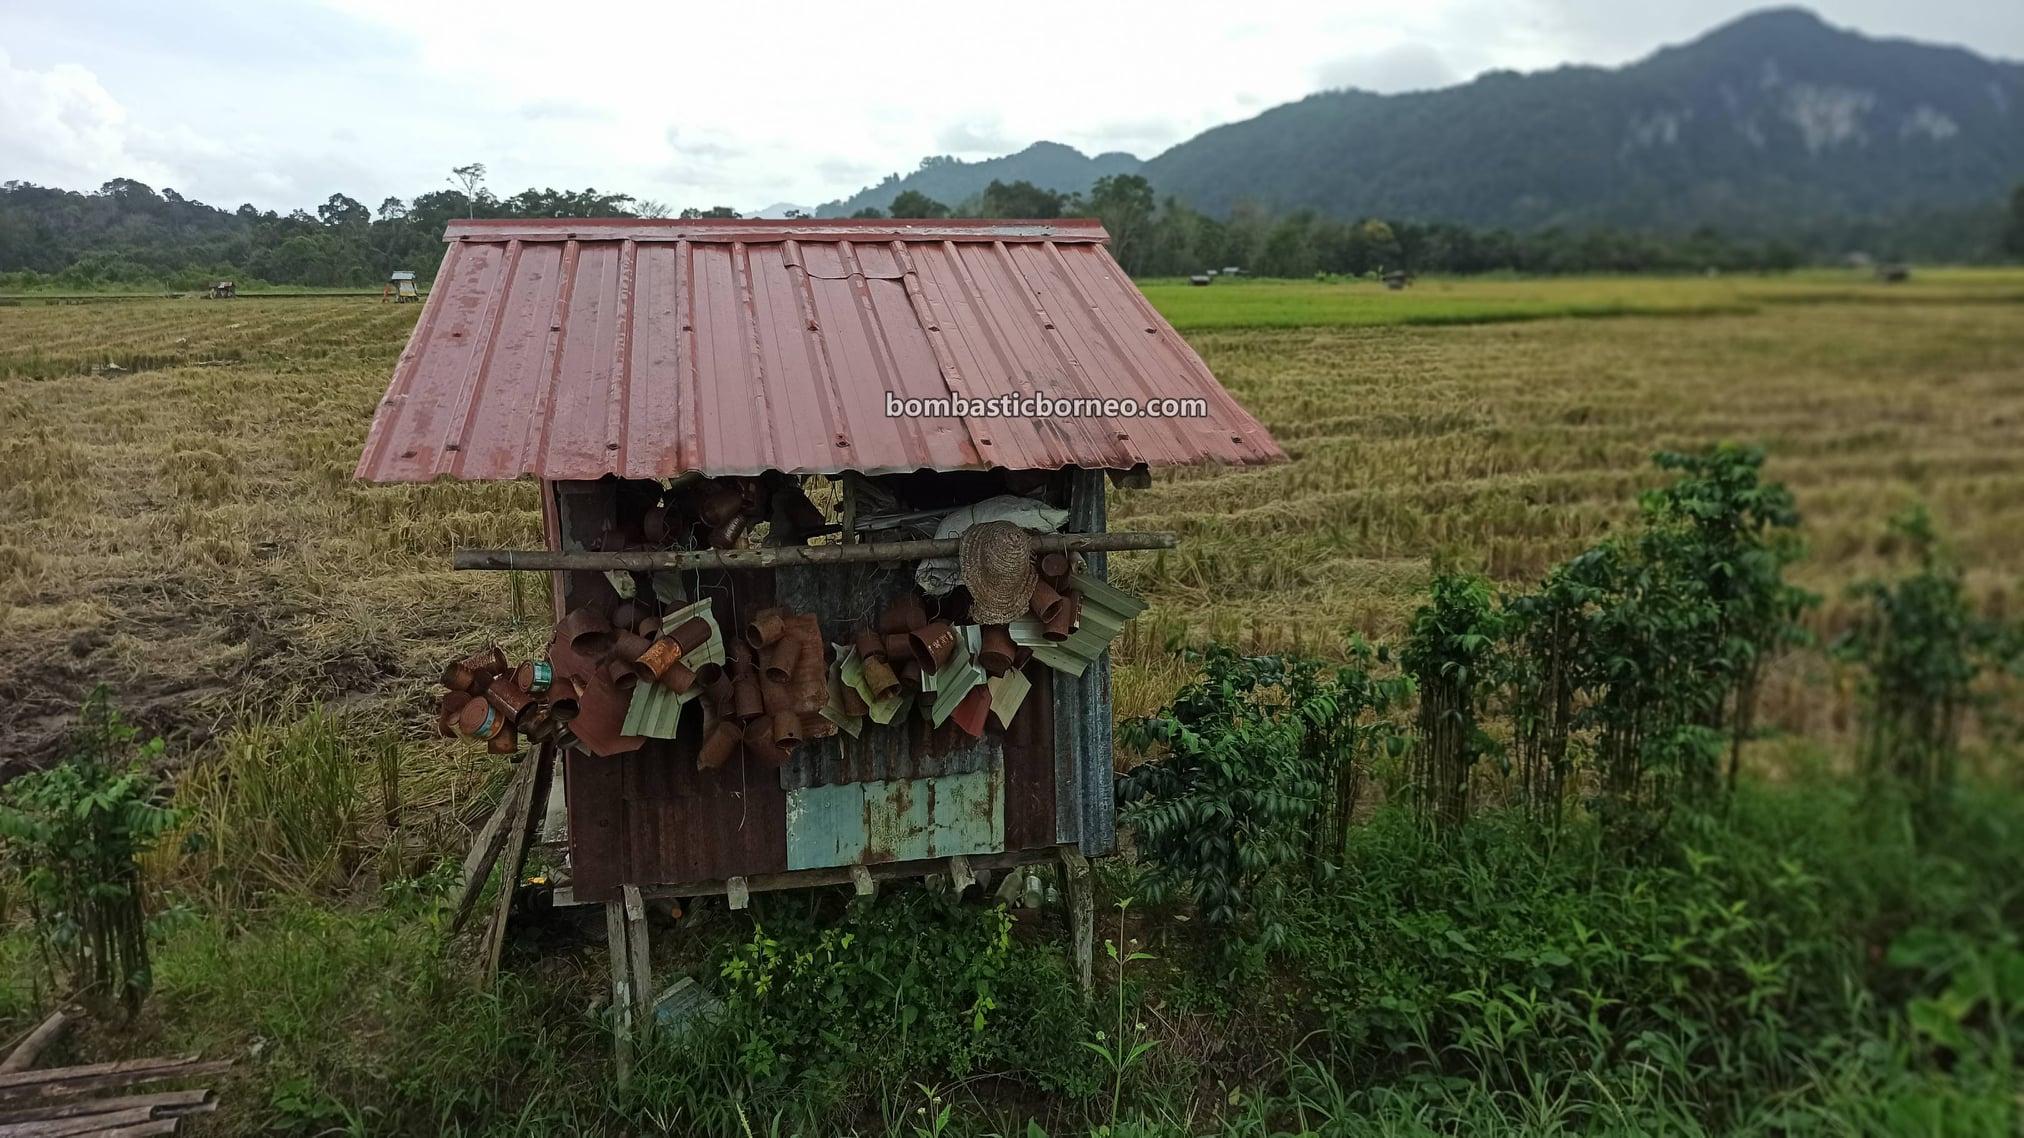 village, Paddy Field, Paddy Farming, Paddy Harvesting, dayak bidayuh, Destination, exploration, Tourism, tourist attraction, travel guide, travel local, Trans Borneo, 探索婆罗洲稻田, 马来西亚砂拉越, 西连稻米之乡